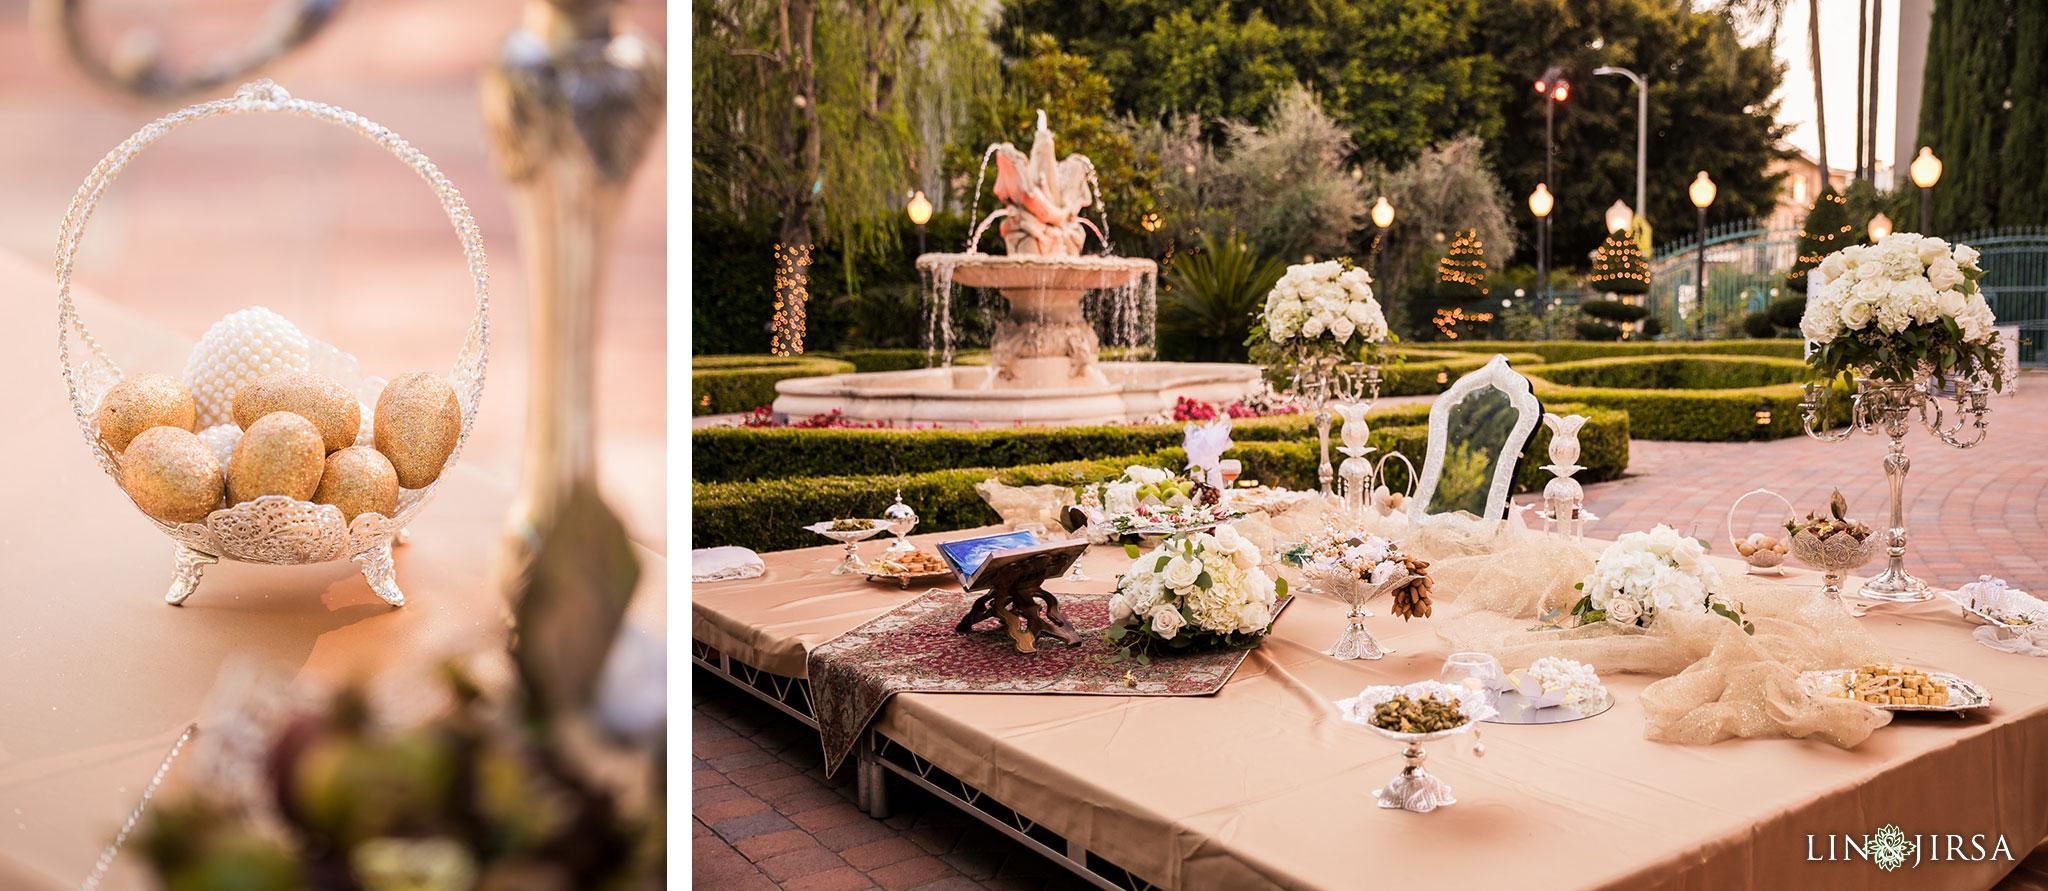 014 taglyan complex los angeles persian wedding photography